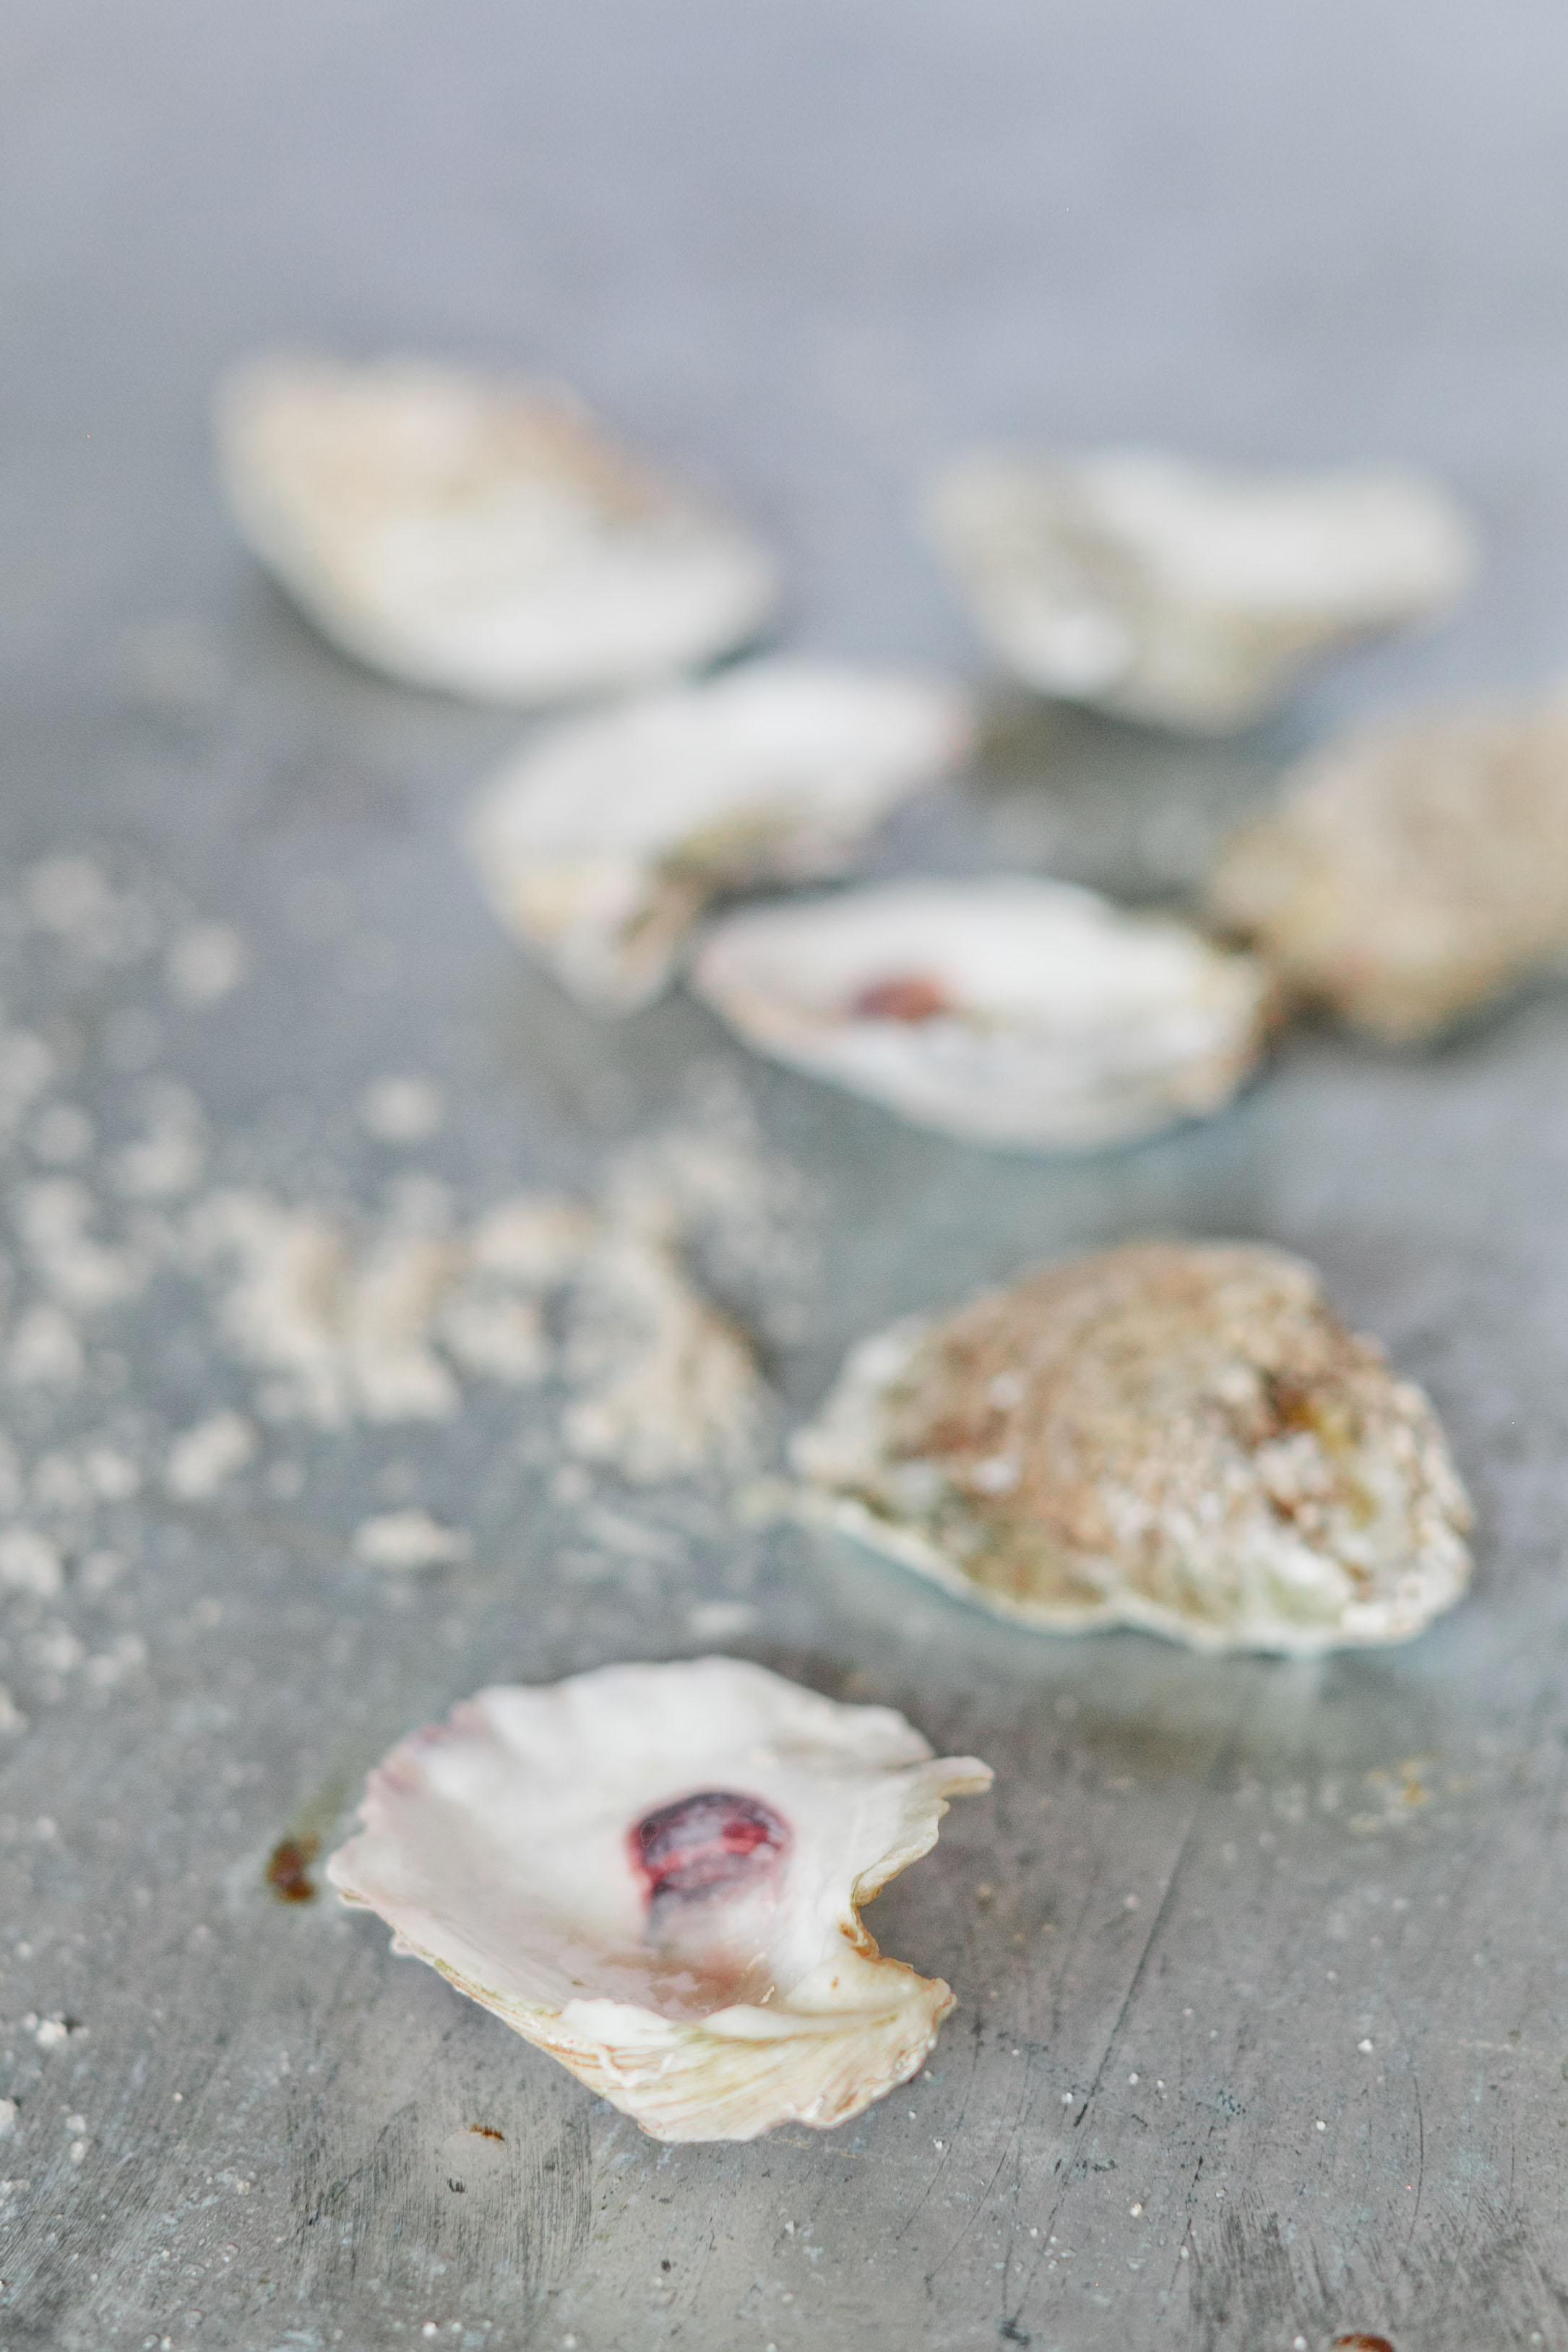 Atlanta-Product-Photographer-DIY-Kathryn-McCrary-Photography-Gold-Oyster-Shells-Craft3.jpg